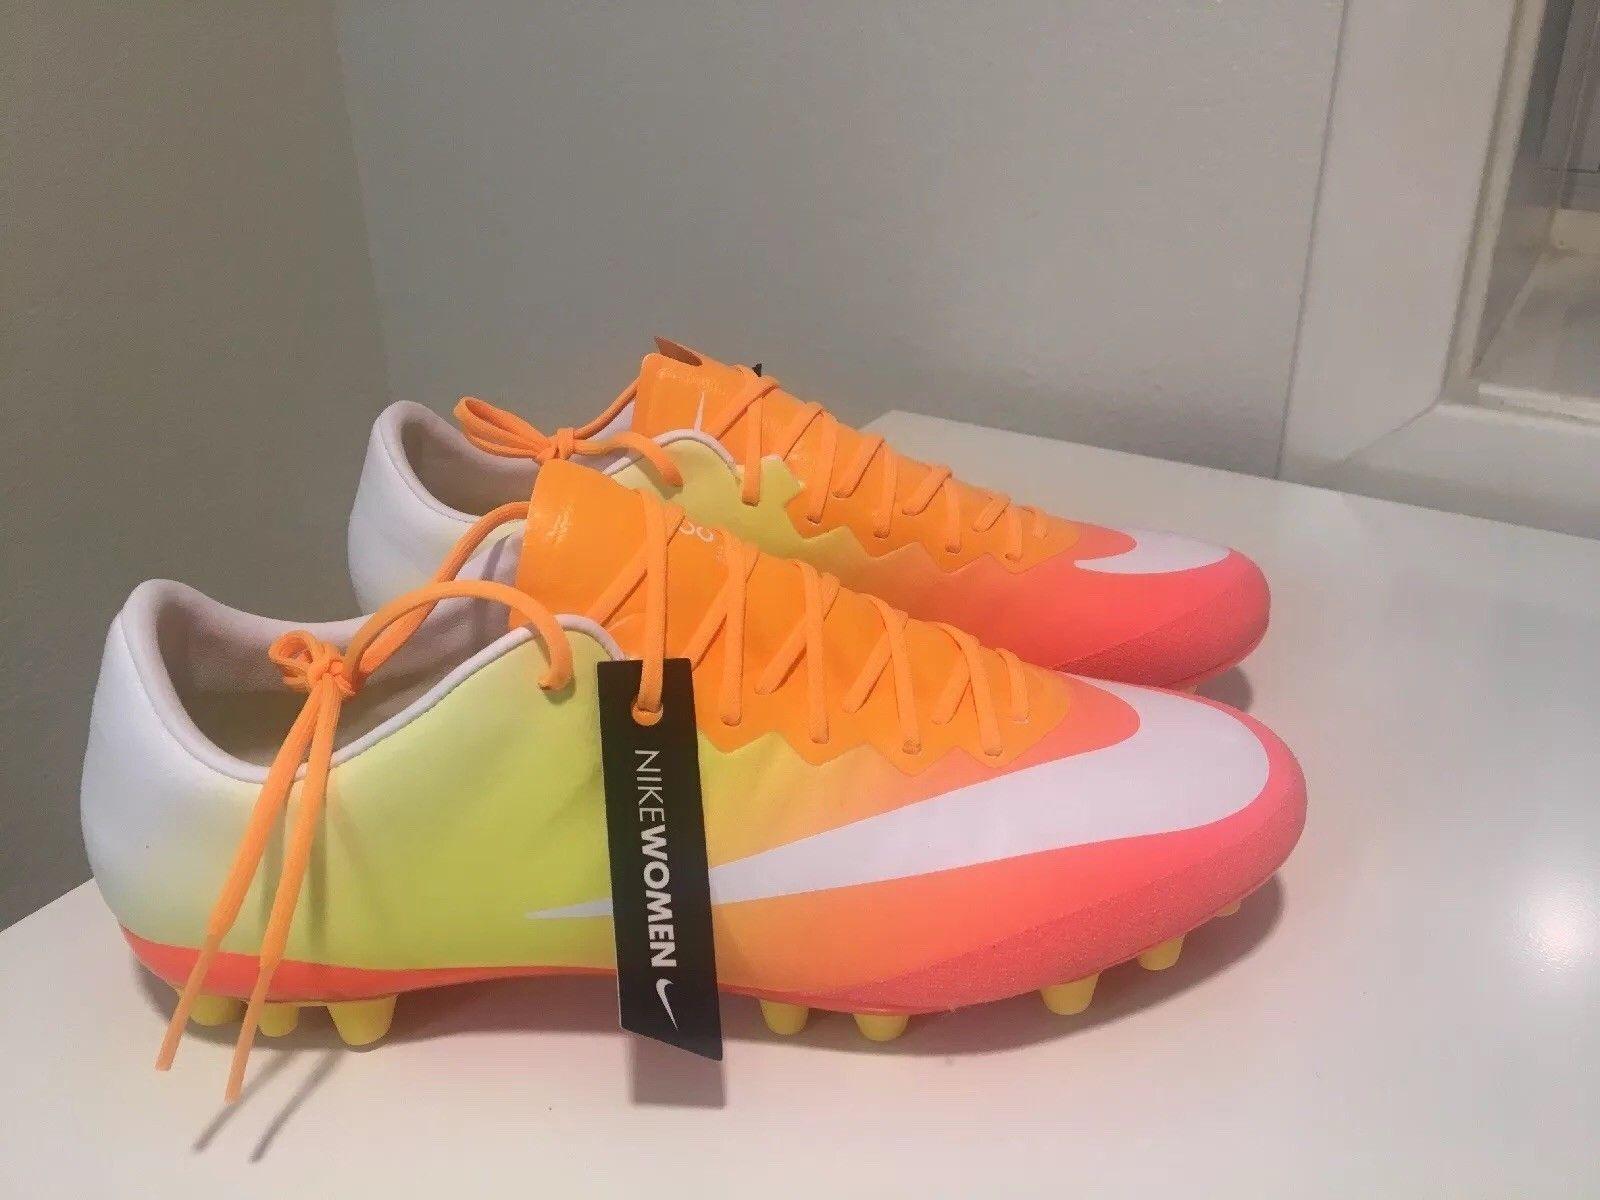 New womens 7.5 Nike Mercurial Vapor X AG Soccer Cleats Sunset orange 749699-800